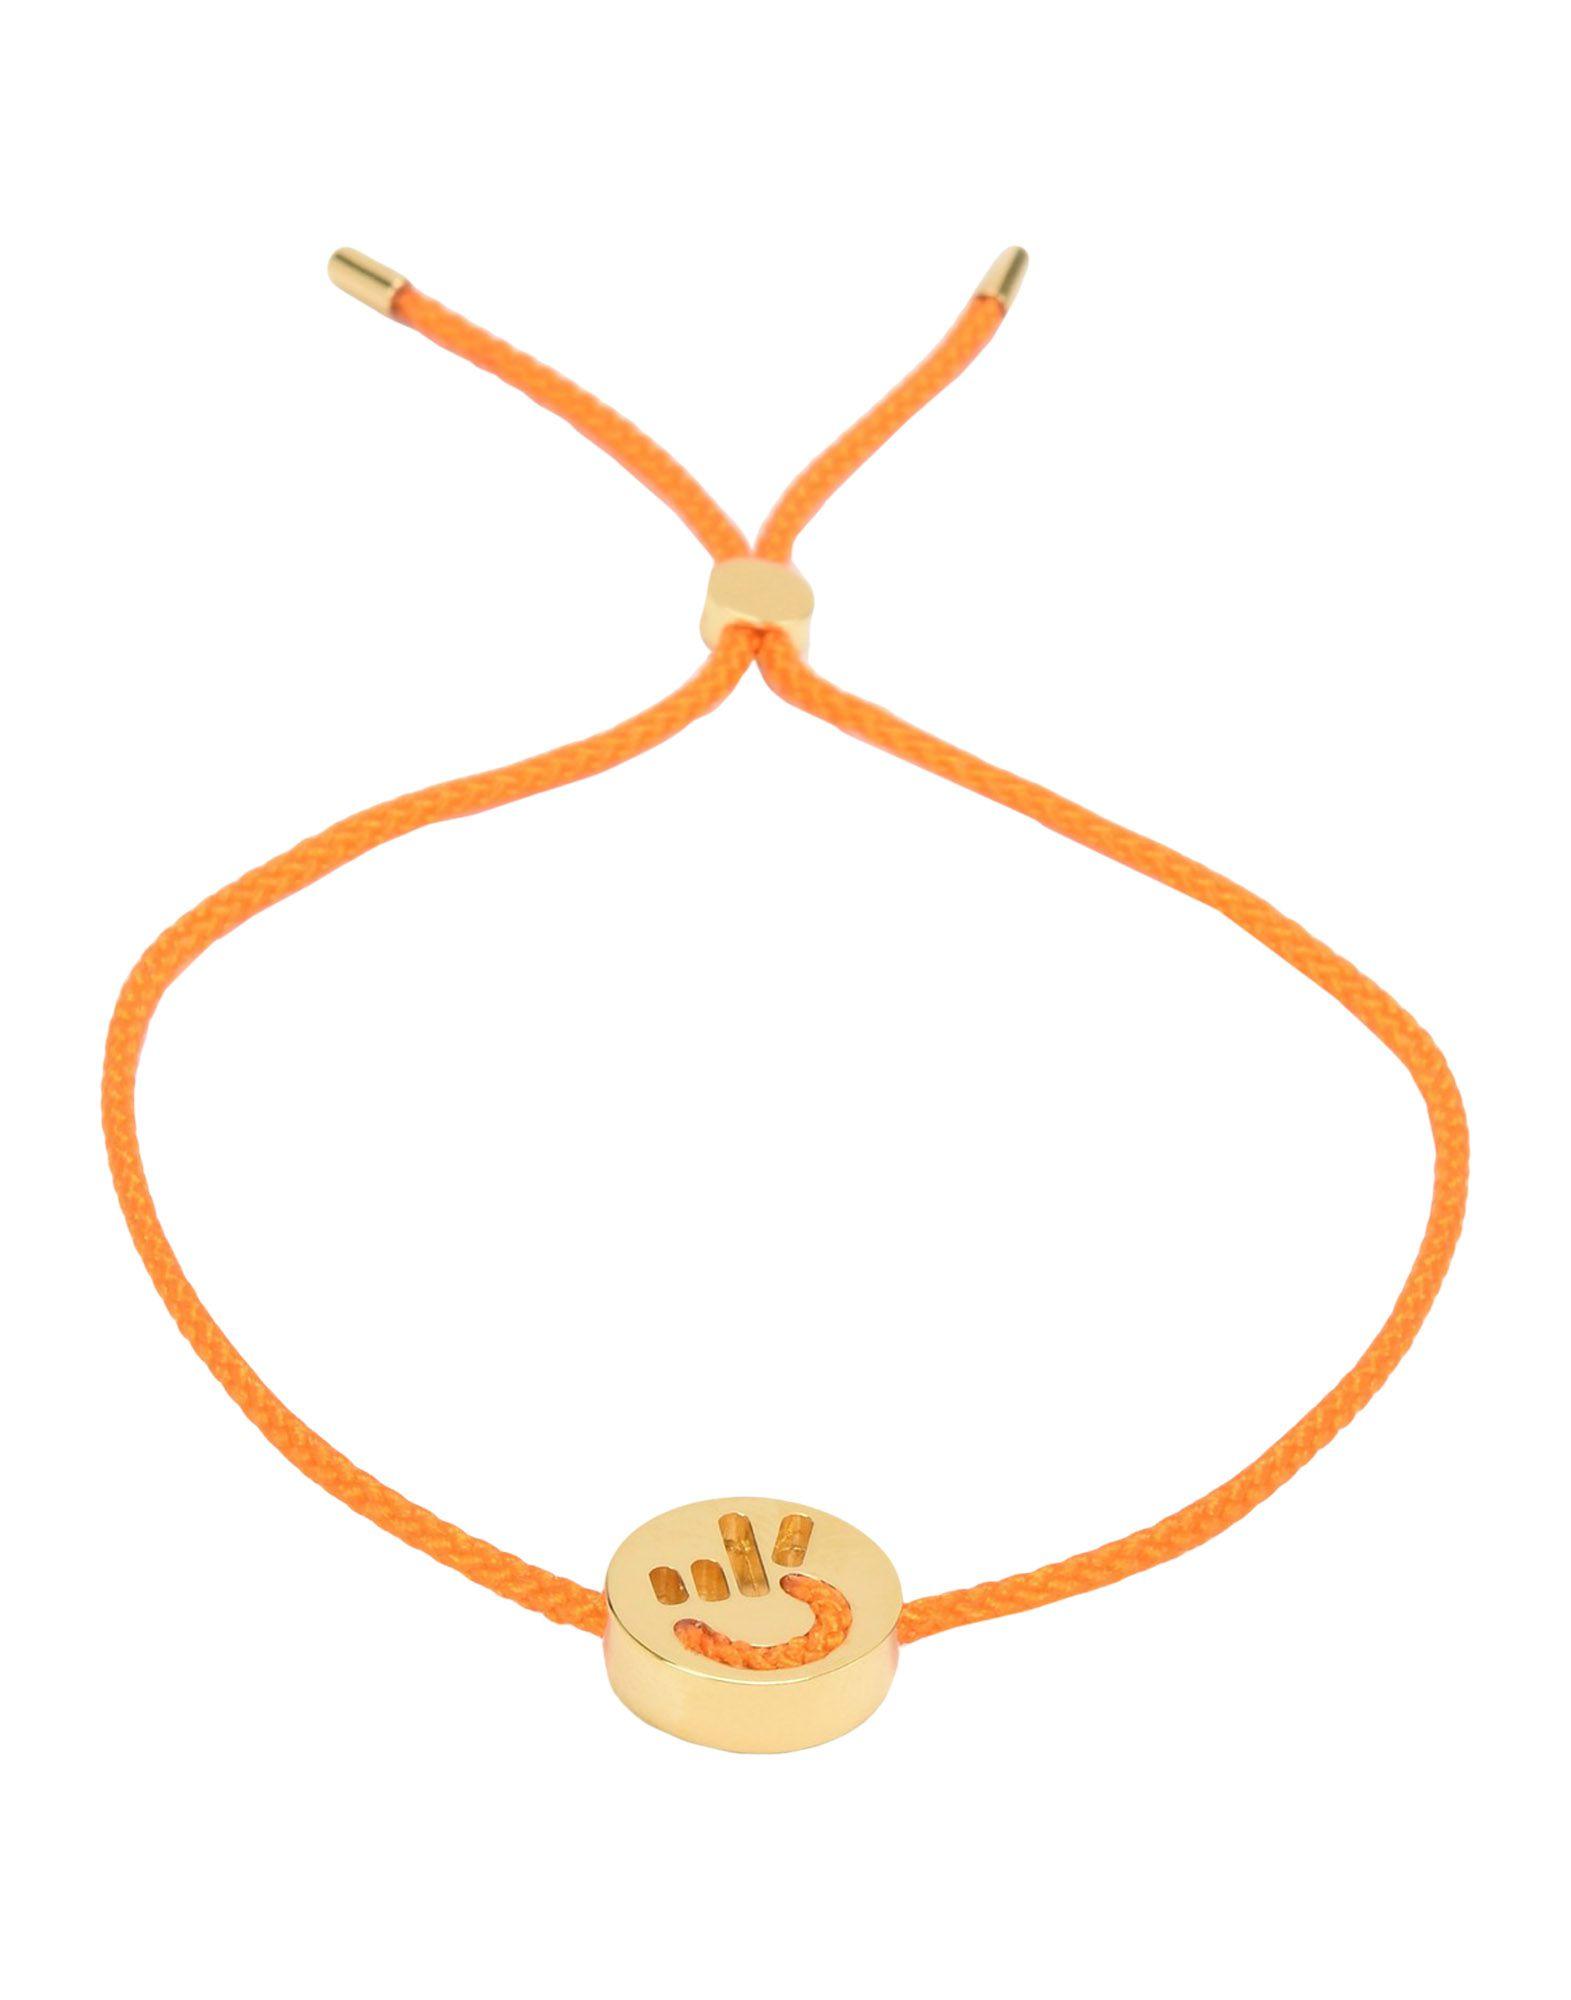 Bracciale Ruifier Friends Hands Up Peace Bracelet_Orange - Uomo - Acquista online su